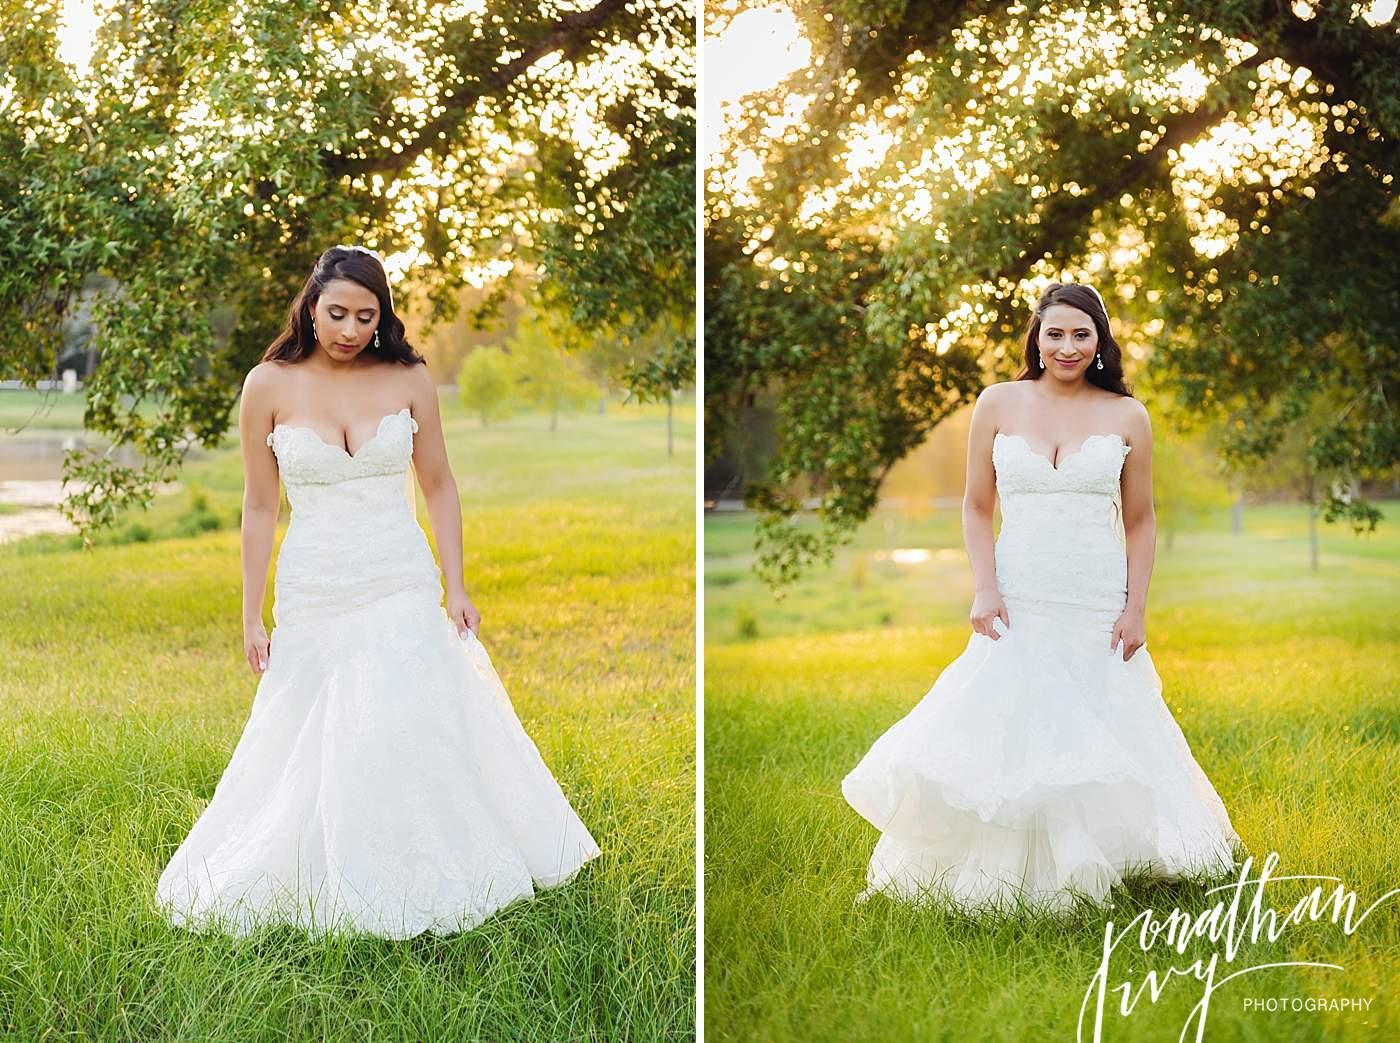 Balmorhea Bridal Photo,Balmorhea Events,Balmorhea Events Bridal,Bridal at Balmorhea,Houston Wedding Photographer,The Woodlands Wedding Photographer,